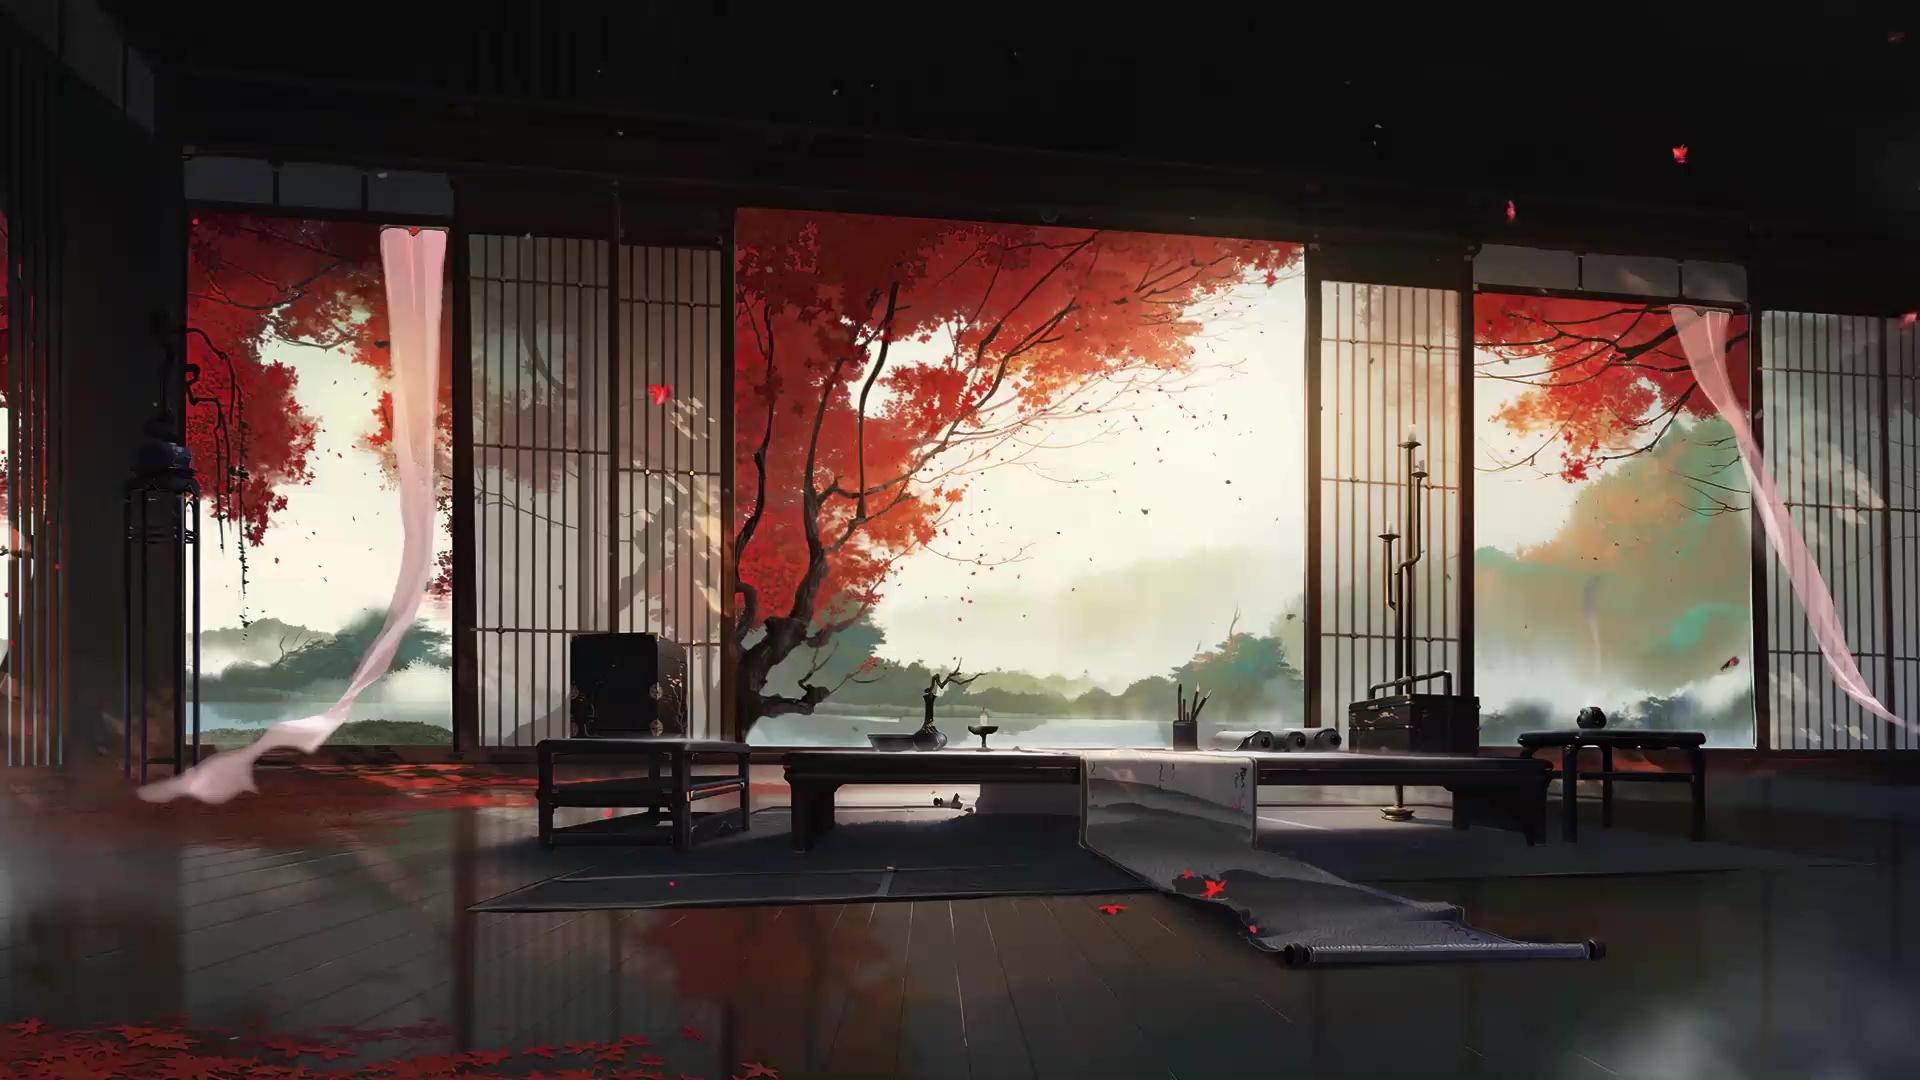 Old House Japan Autumn Leaves Live Wallpaper Wallpaperwaifu